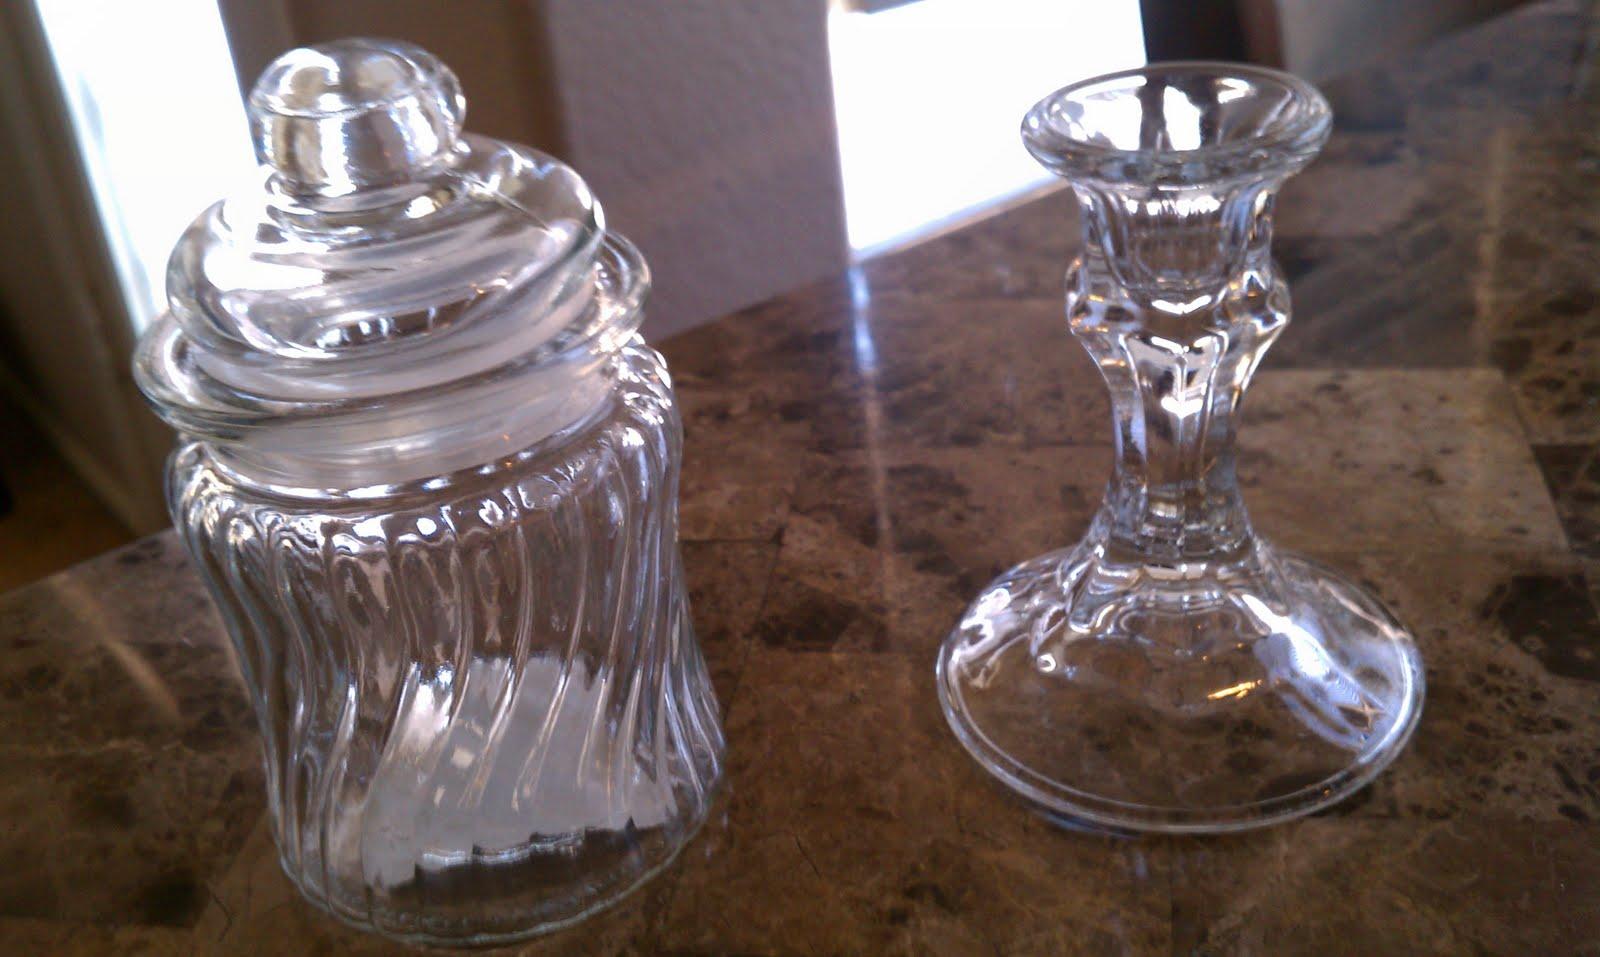 Jar and candle stick holder form the dollar store each specimen jar